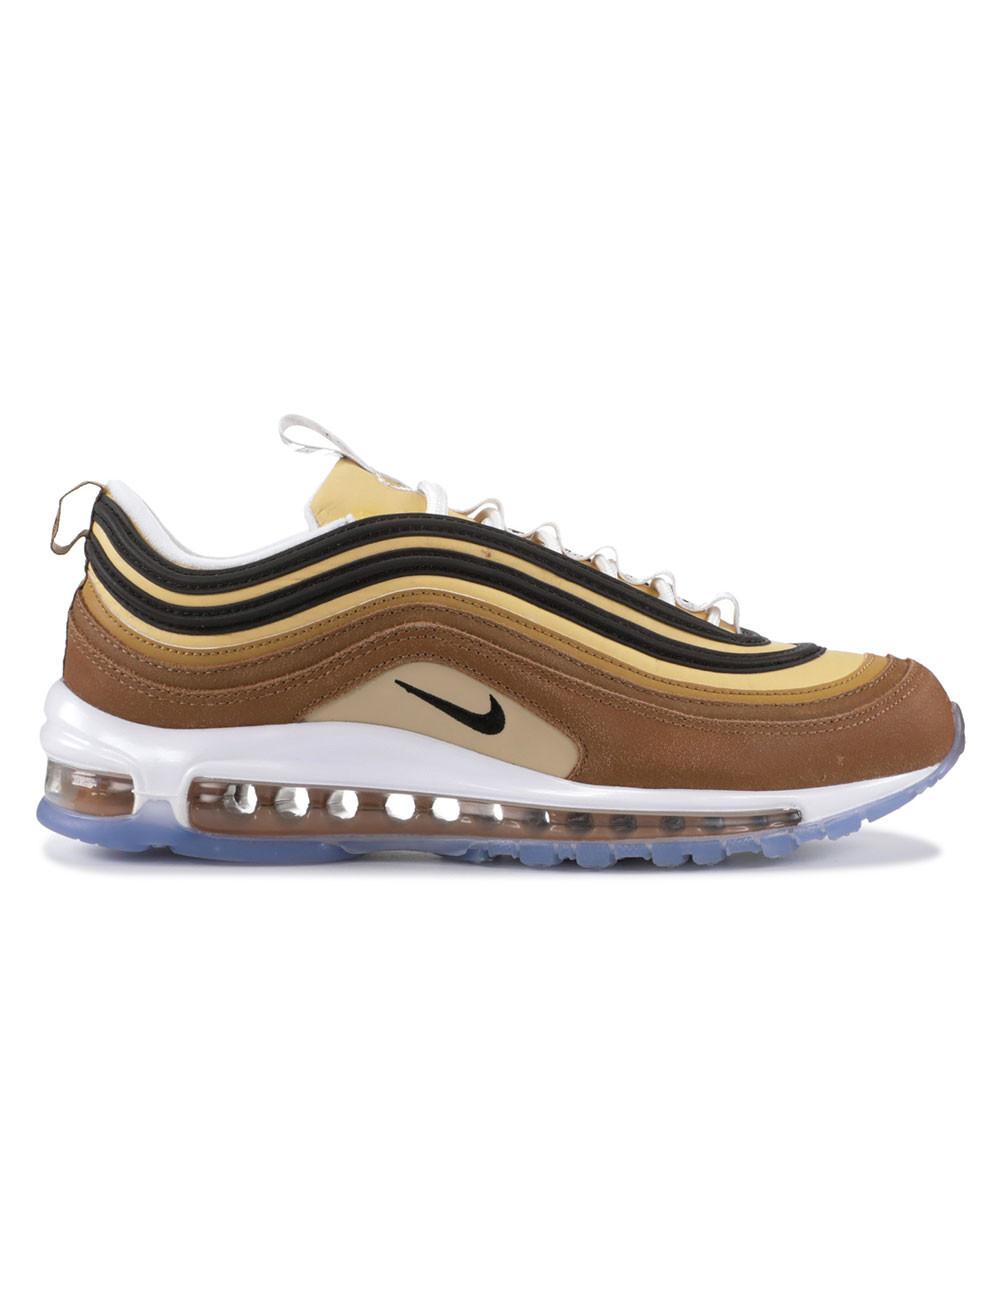 Nike sportswear Air max 97 - 921826-201 | Shapestore.it